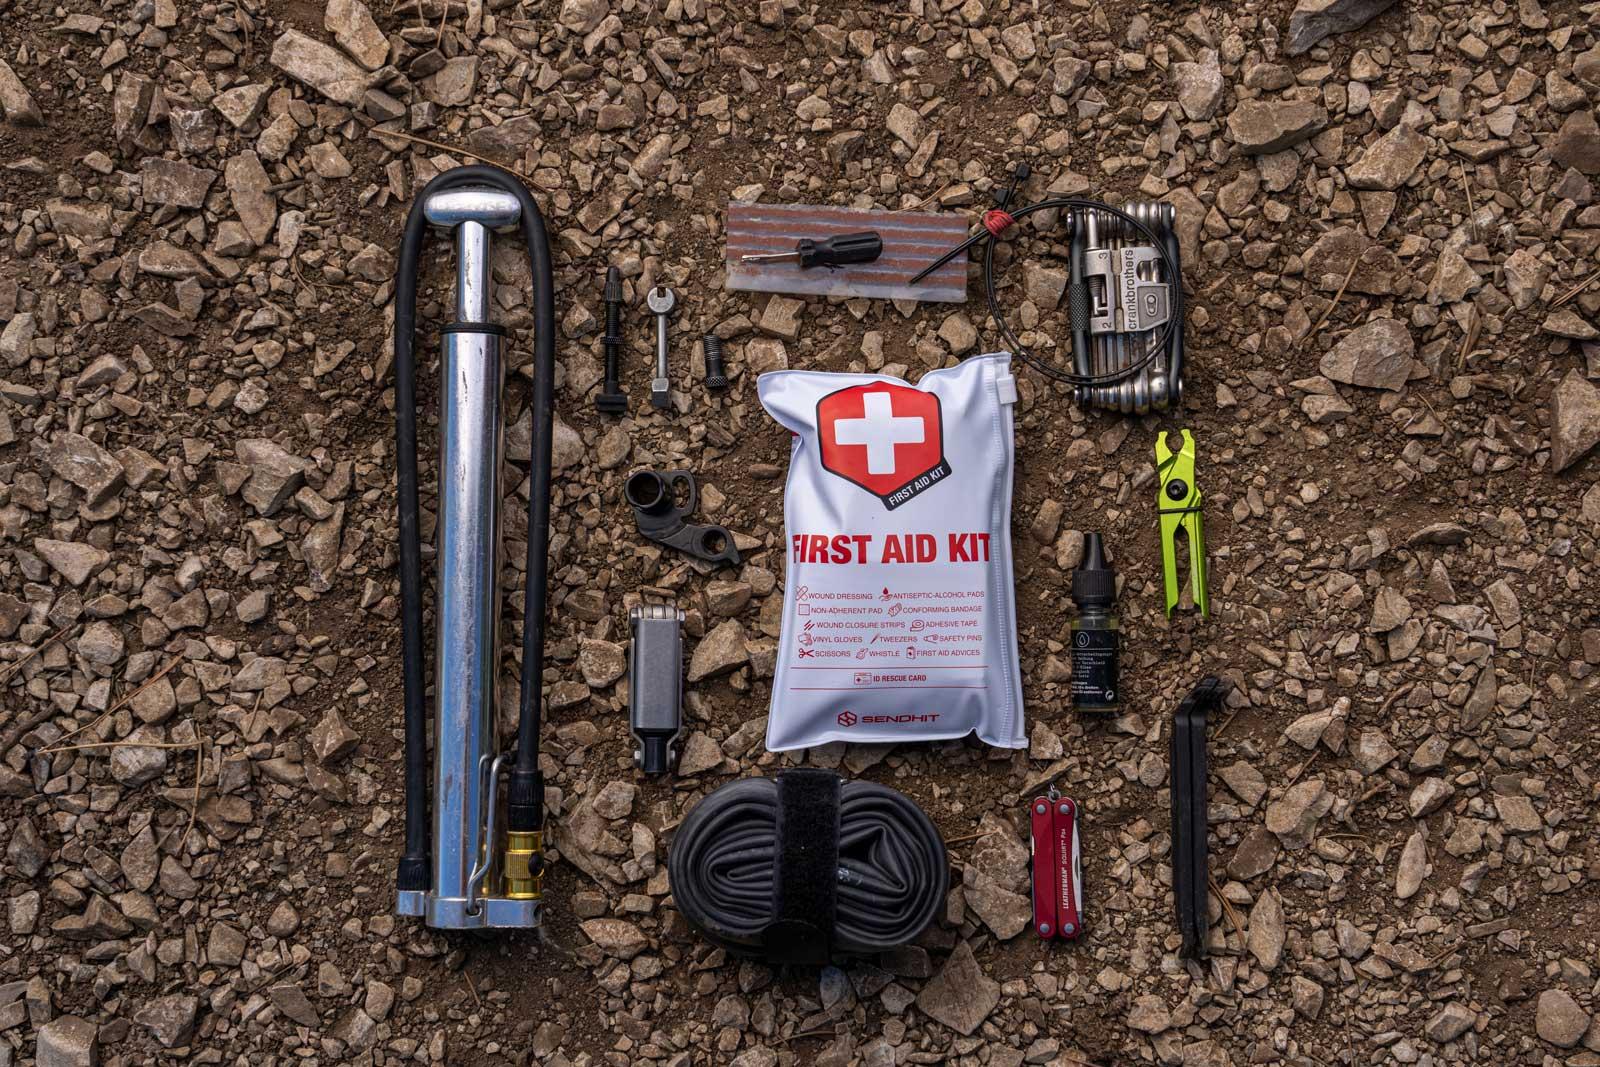 sendit mtb first aid kit plus trailside repair tools